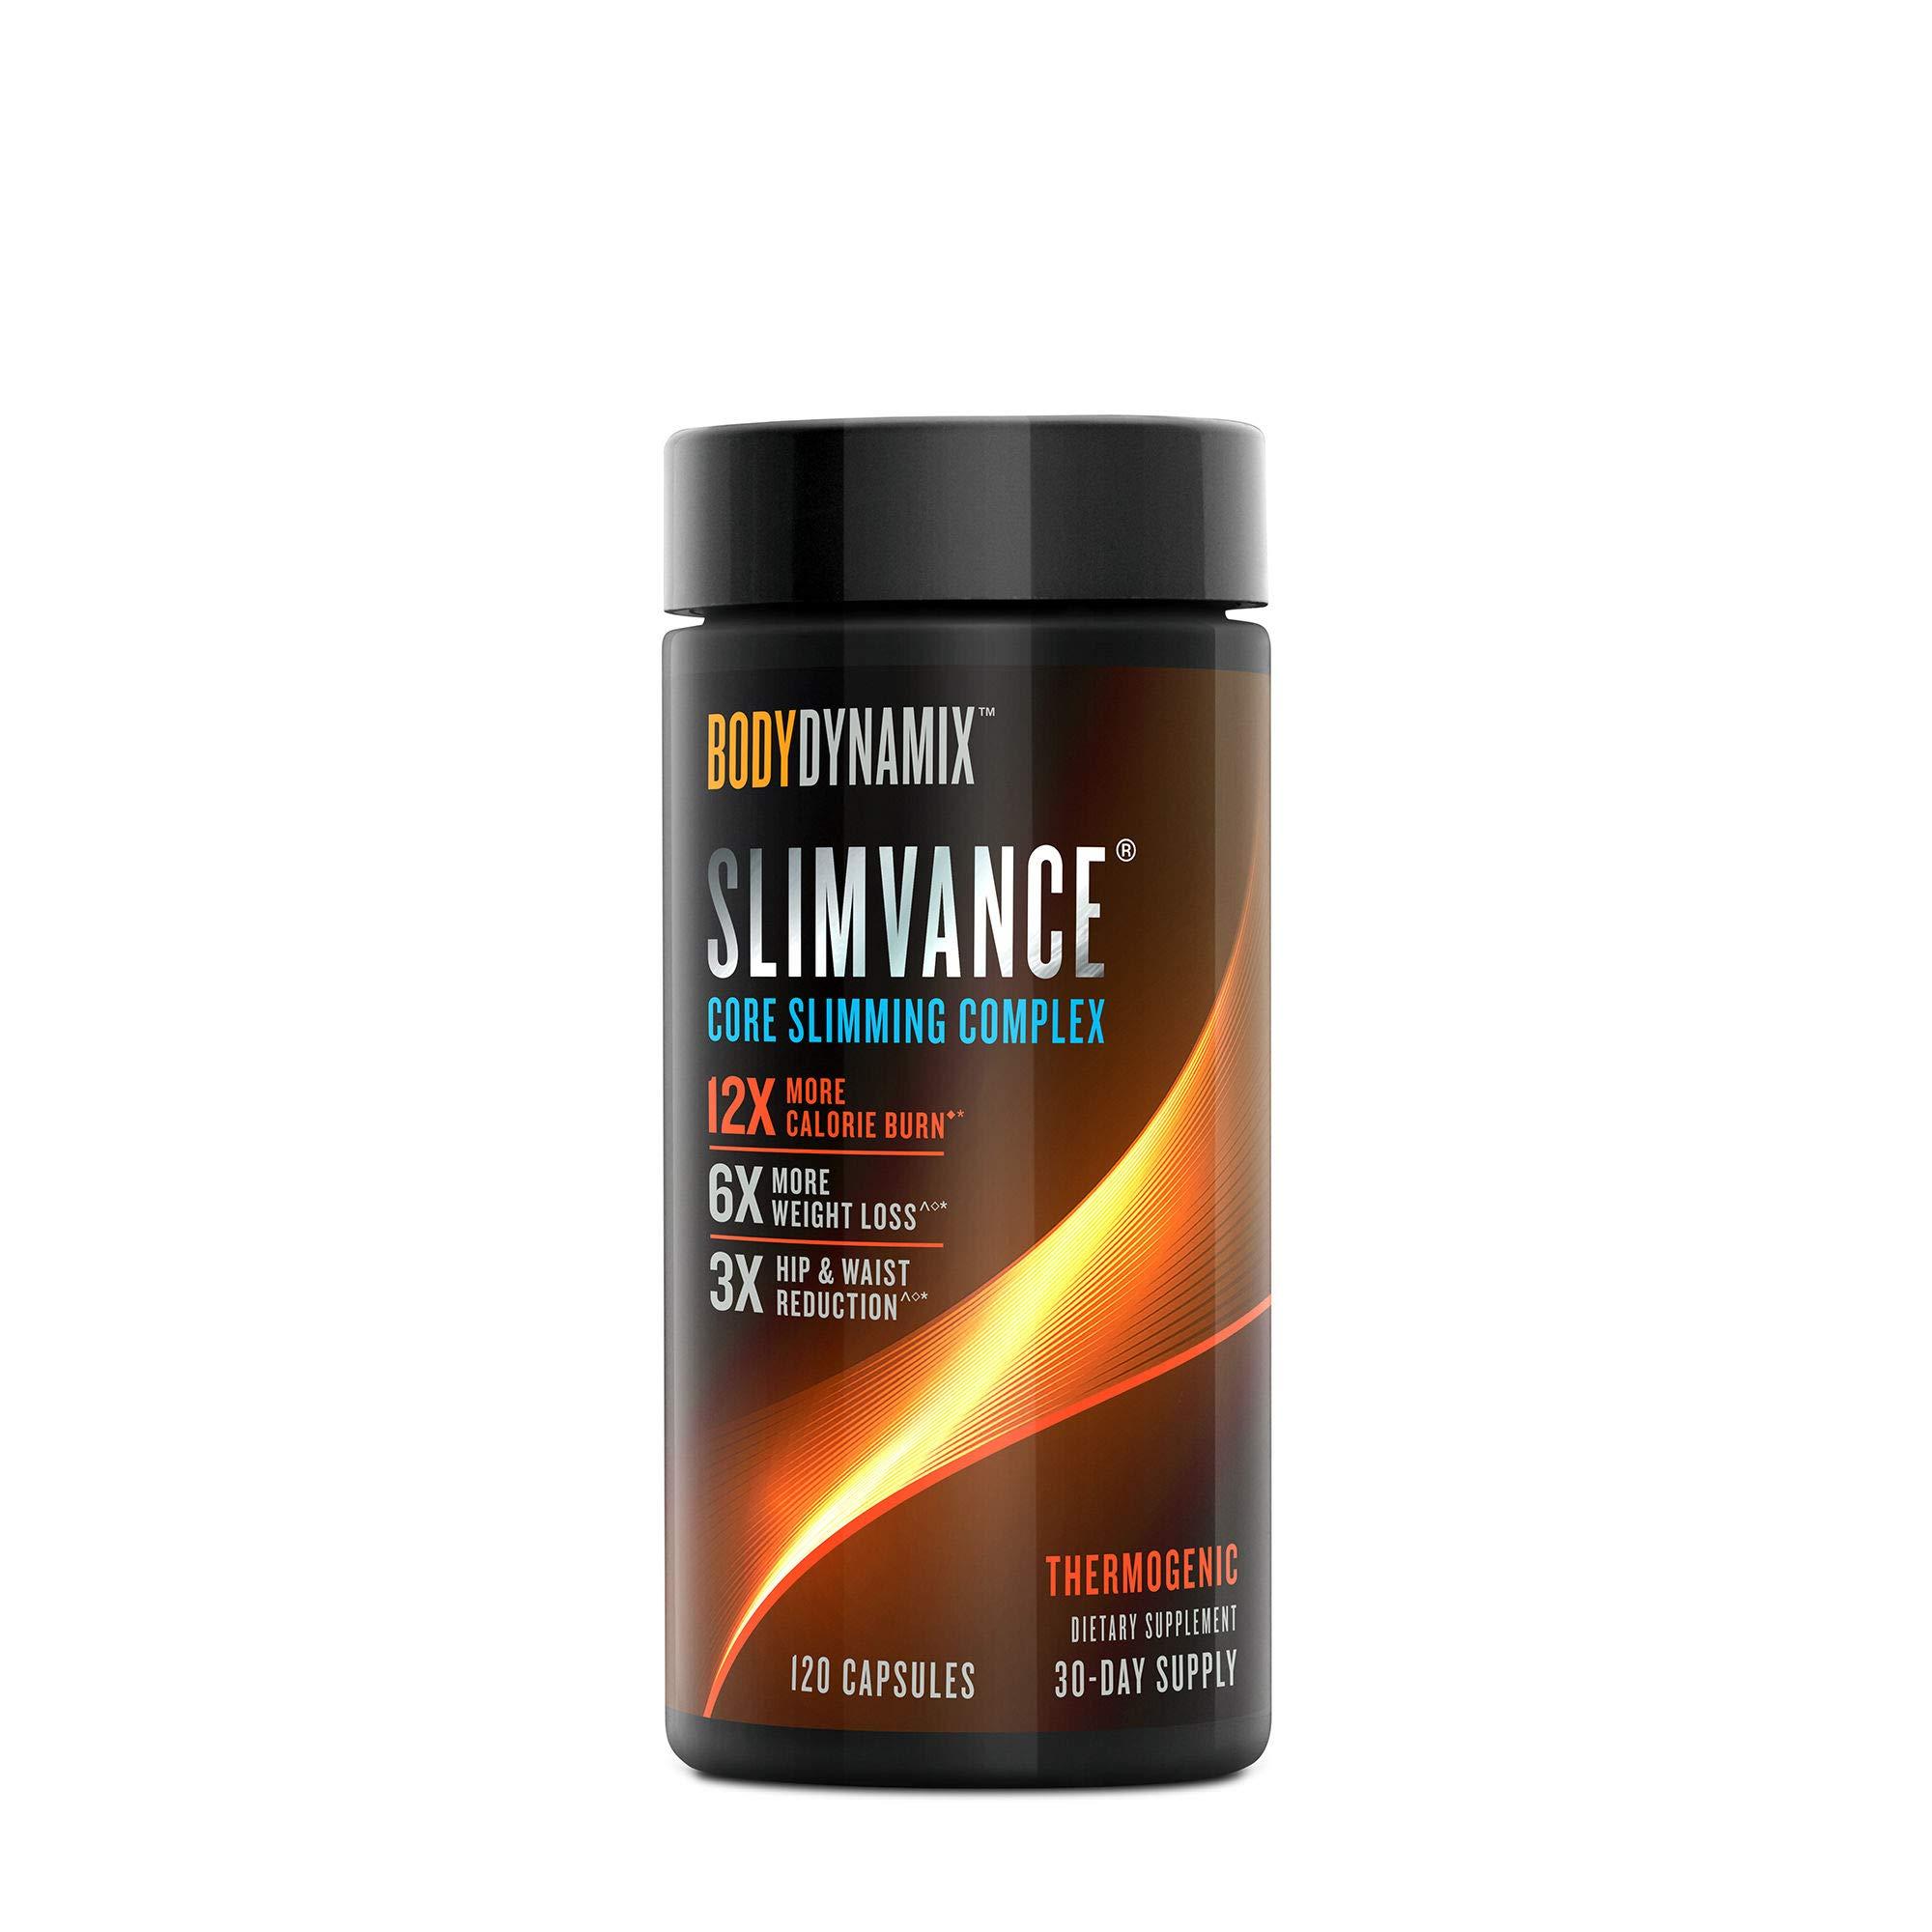 BodyDynamix Slimvance Thermogenic, 30 Day Supply by SLIMVANCE (Image #3)